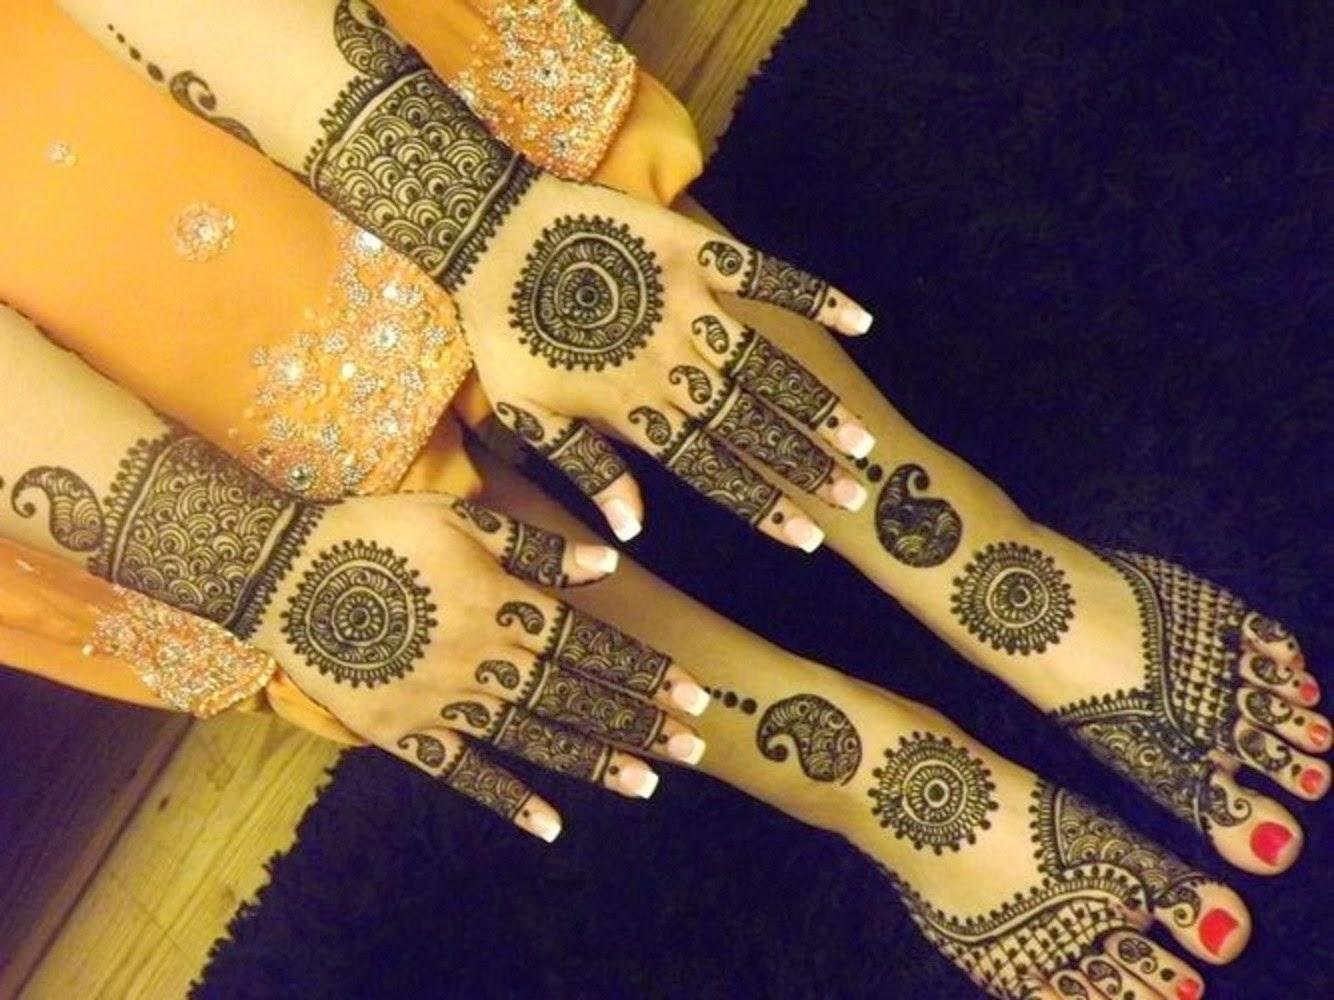 Mehndi Wallpapers Feet : Bridal mehndi designs new feet and hand